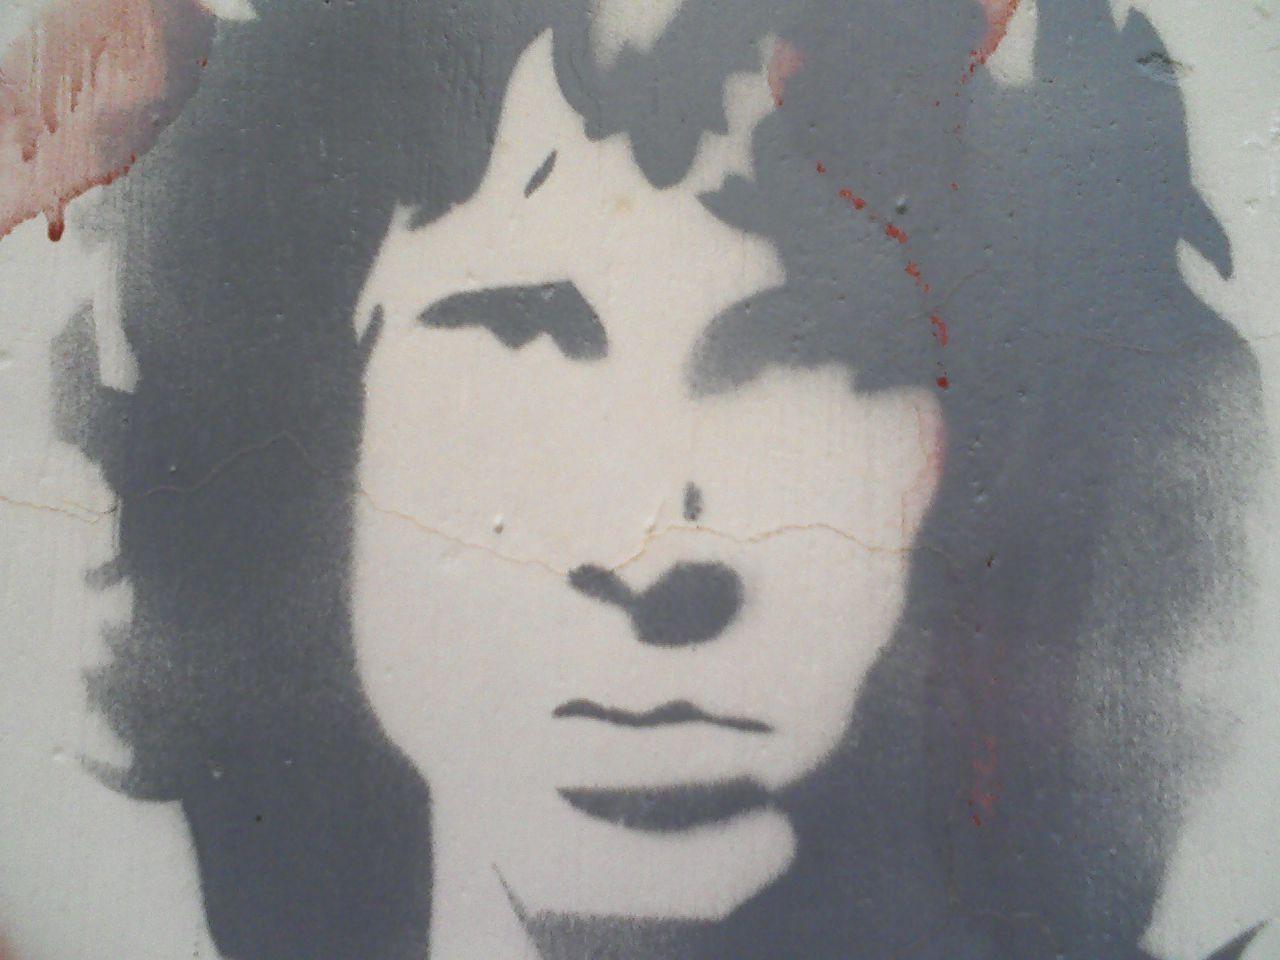 Jim Morrison, l'incarnation absolue de la sex, drug and rock and roll attitude.